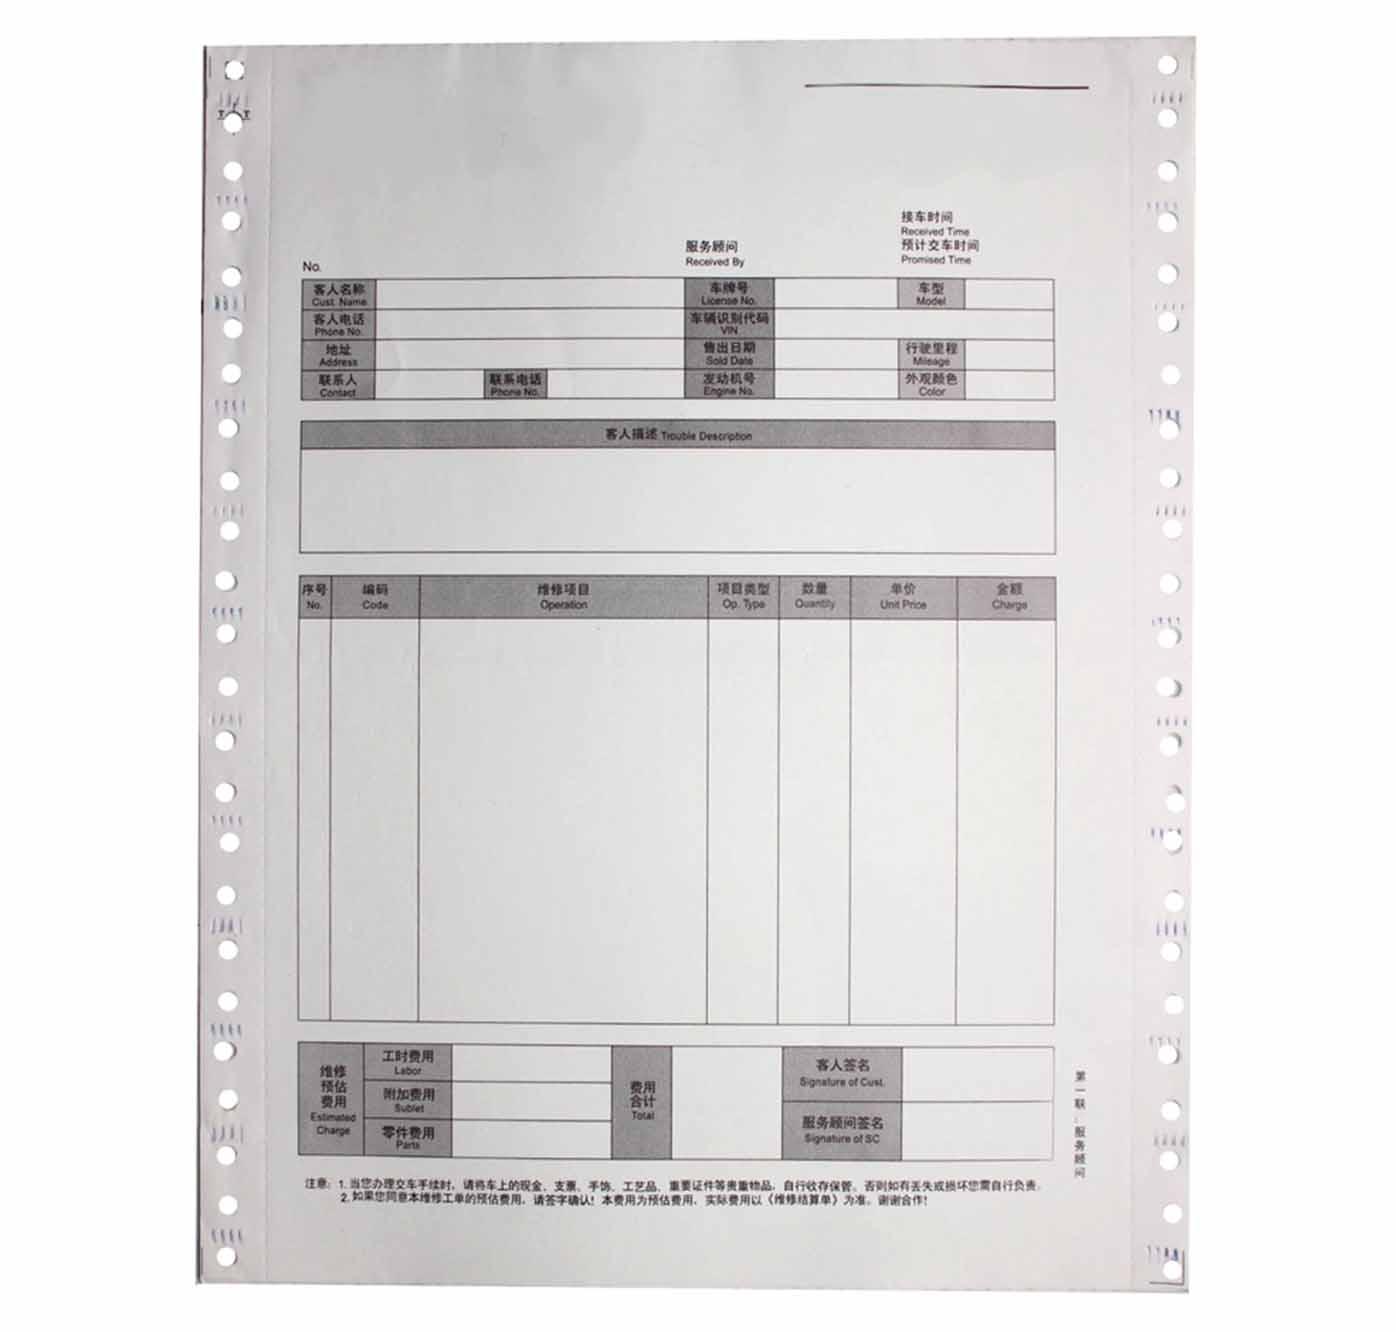 4S汽车维修工单电脑票据